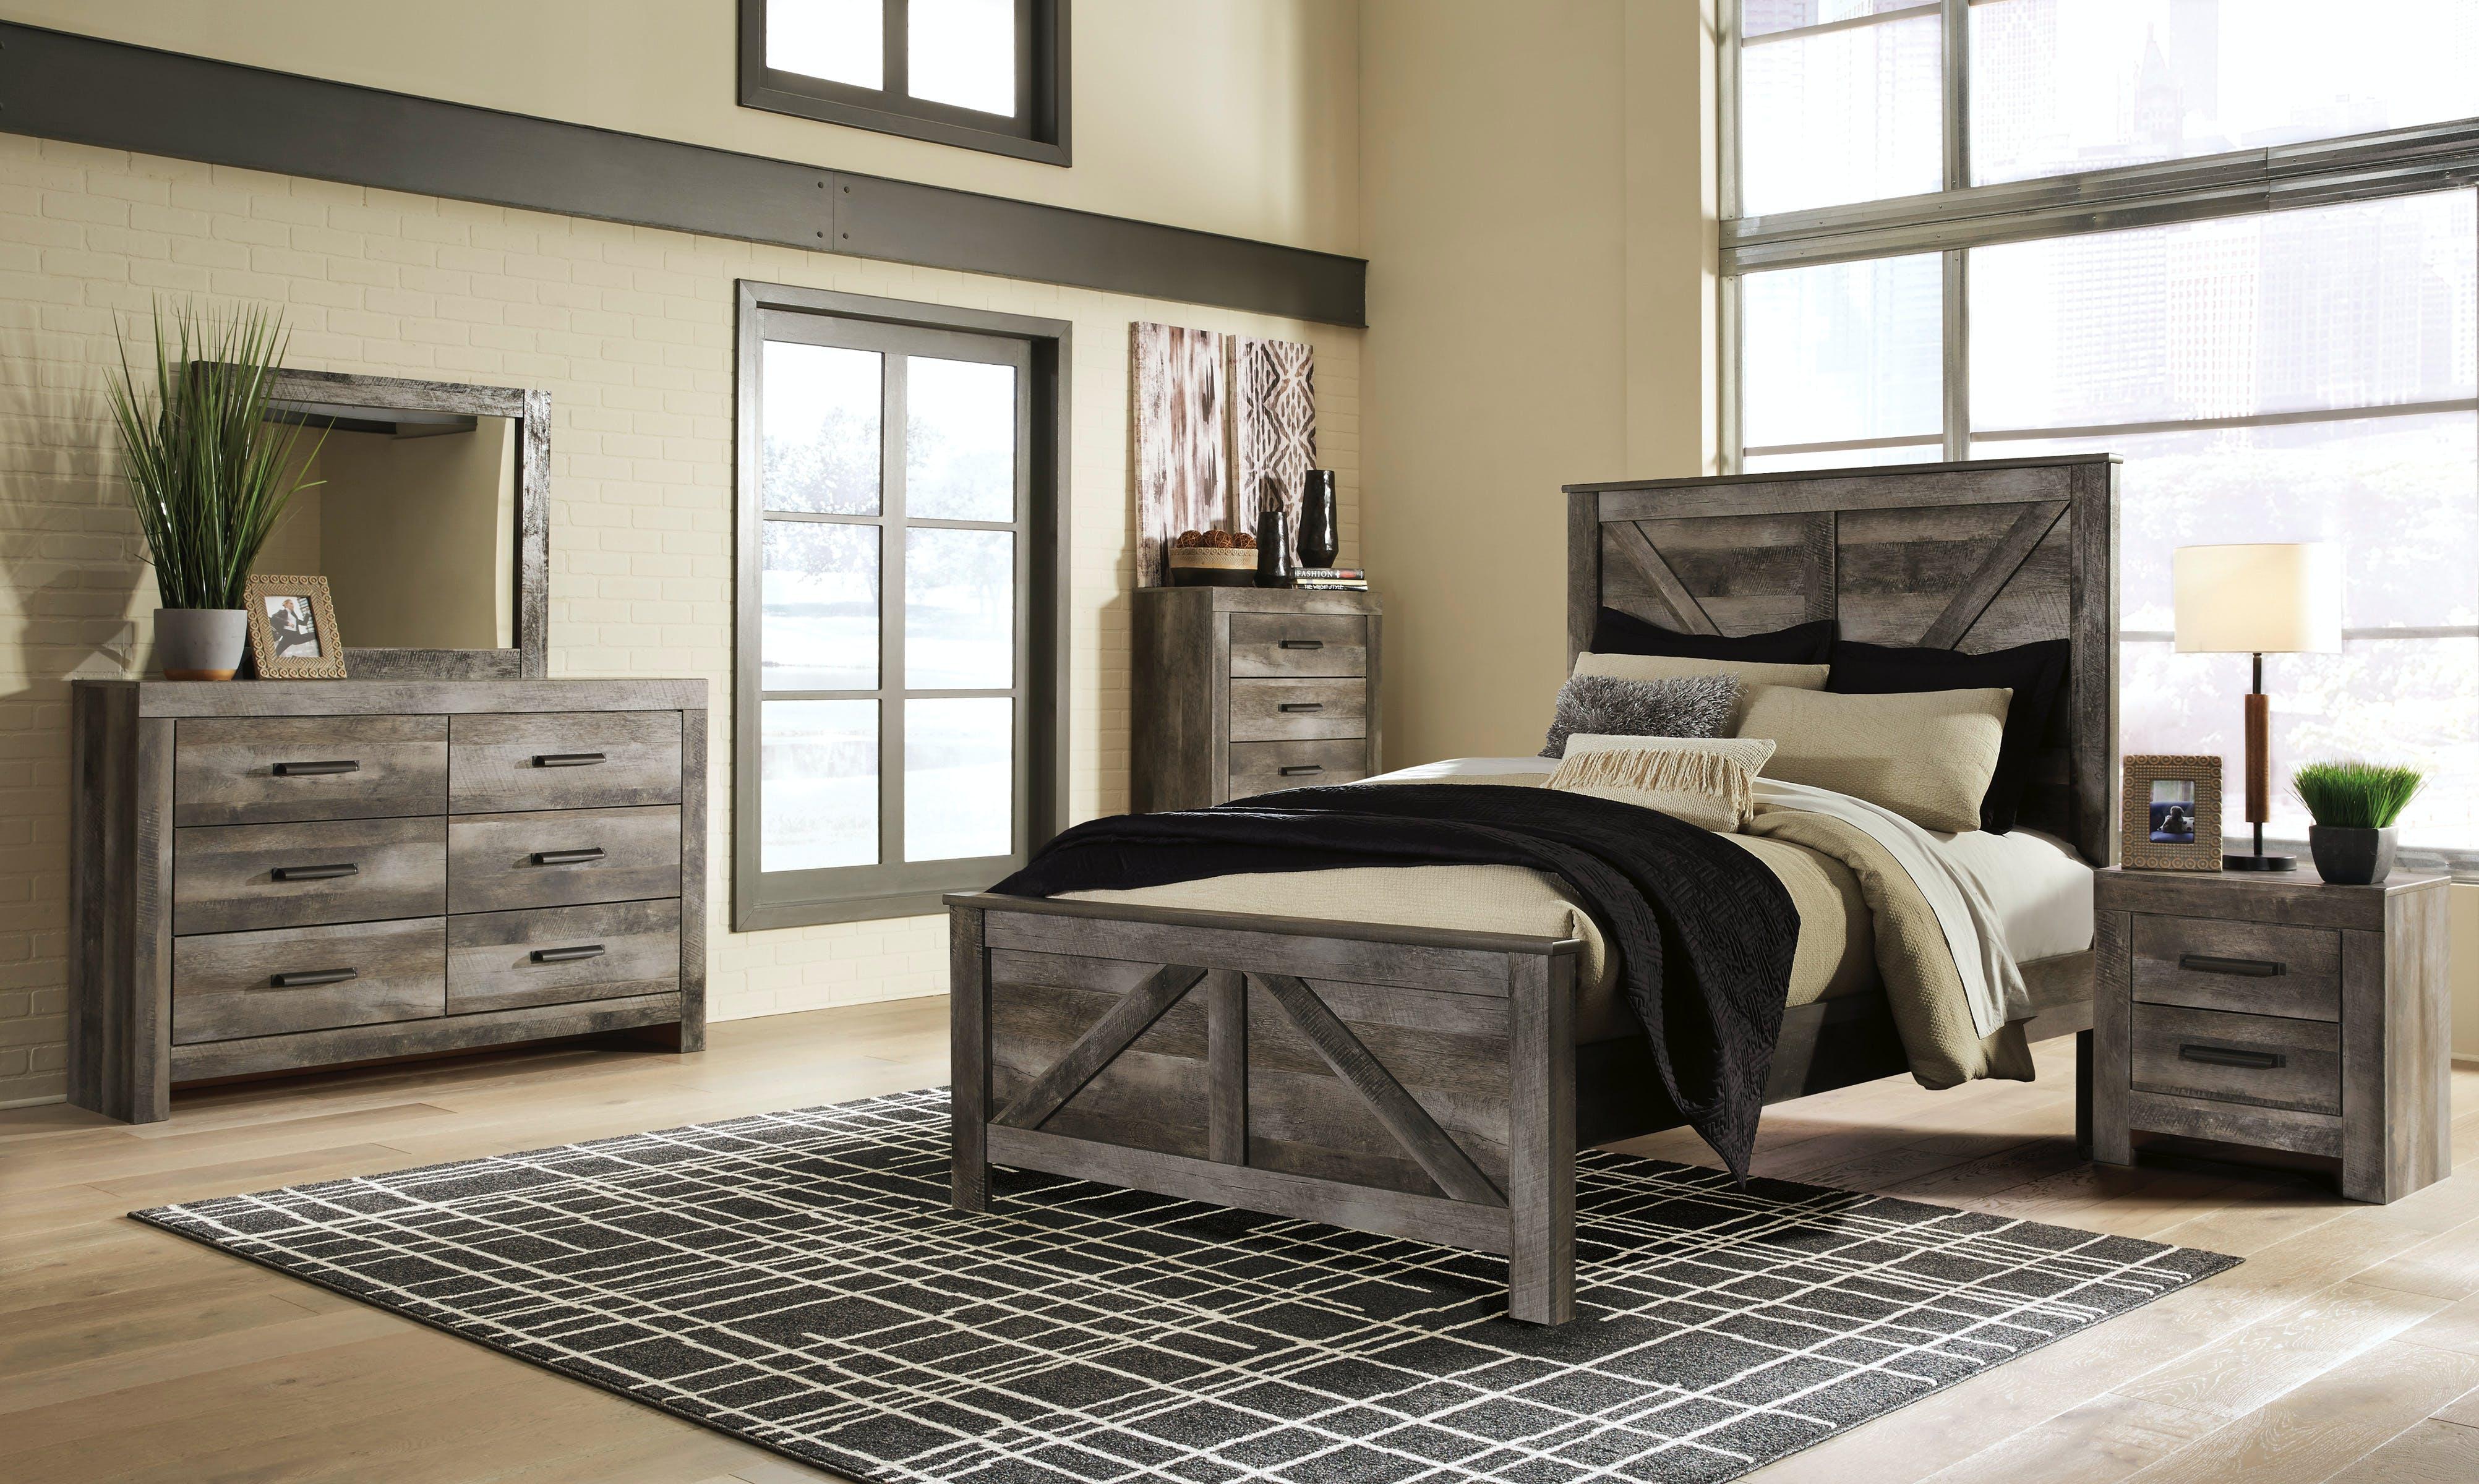 Wynnlow King Bed Dresser Mirror Farmers Home Furniture